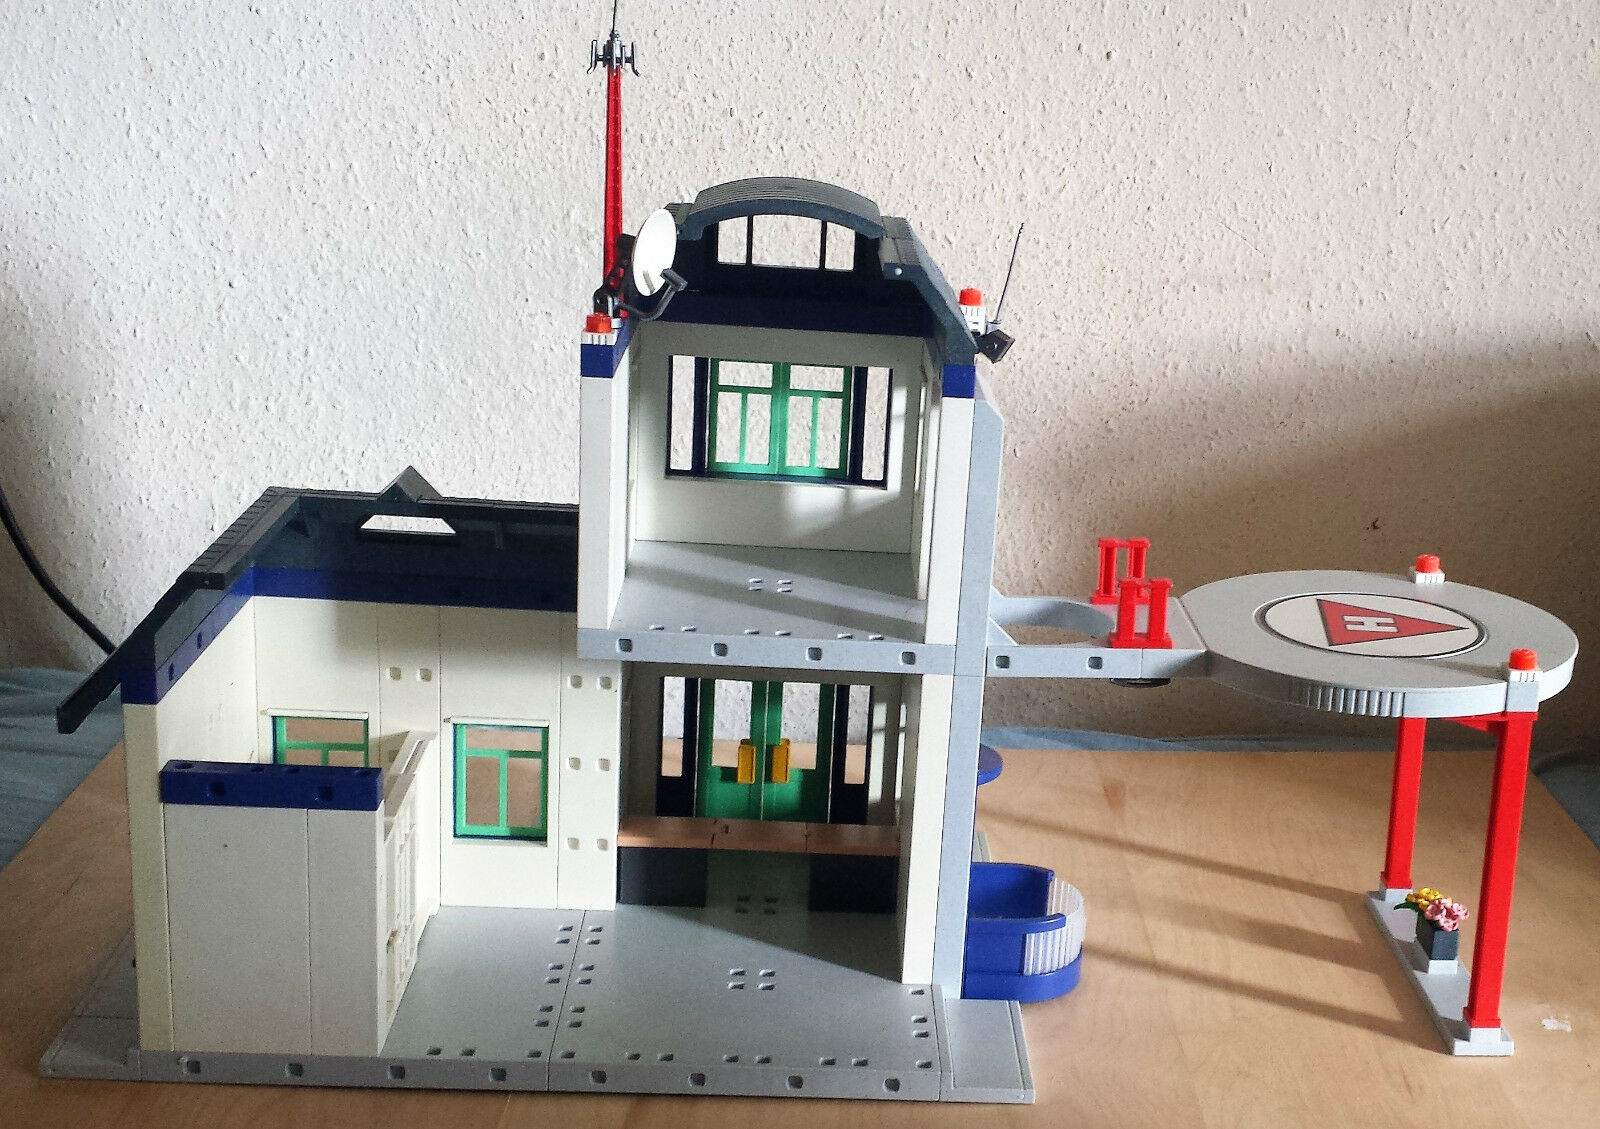 Playmobil Polizeistation und 3988 und Polizeistation Polizeiauto e9c9af